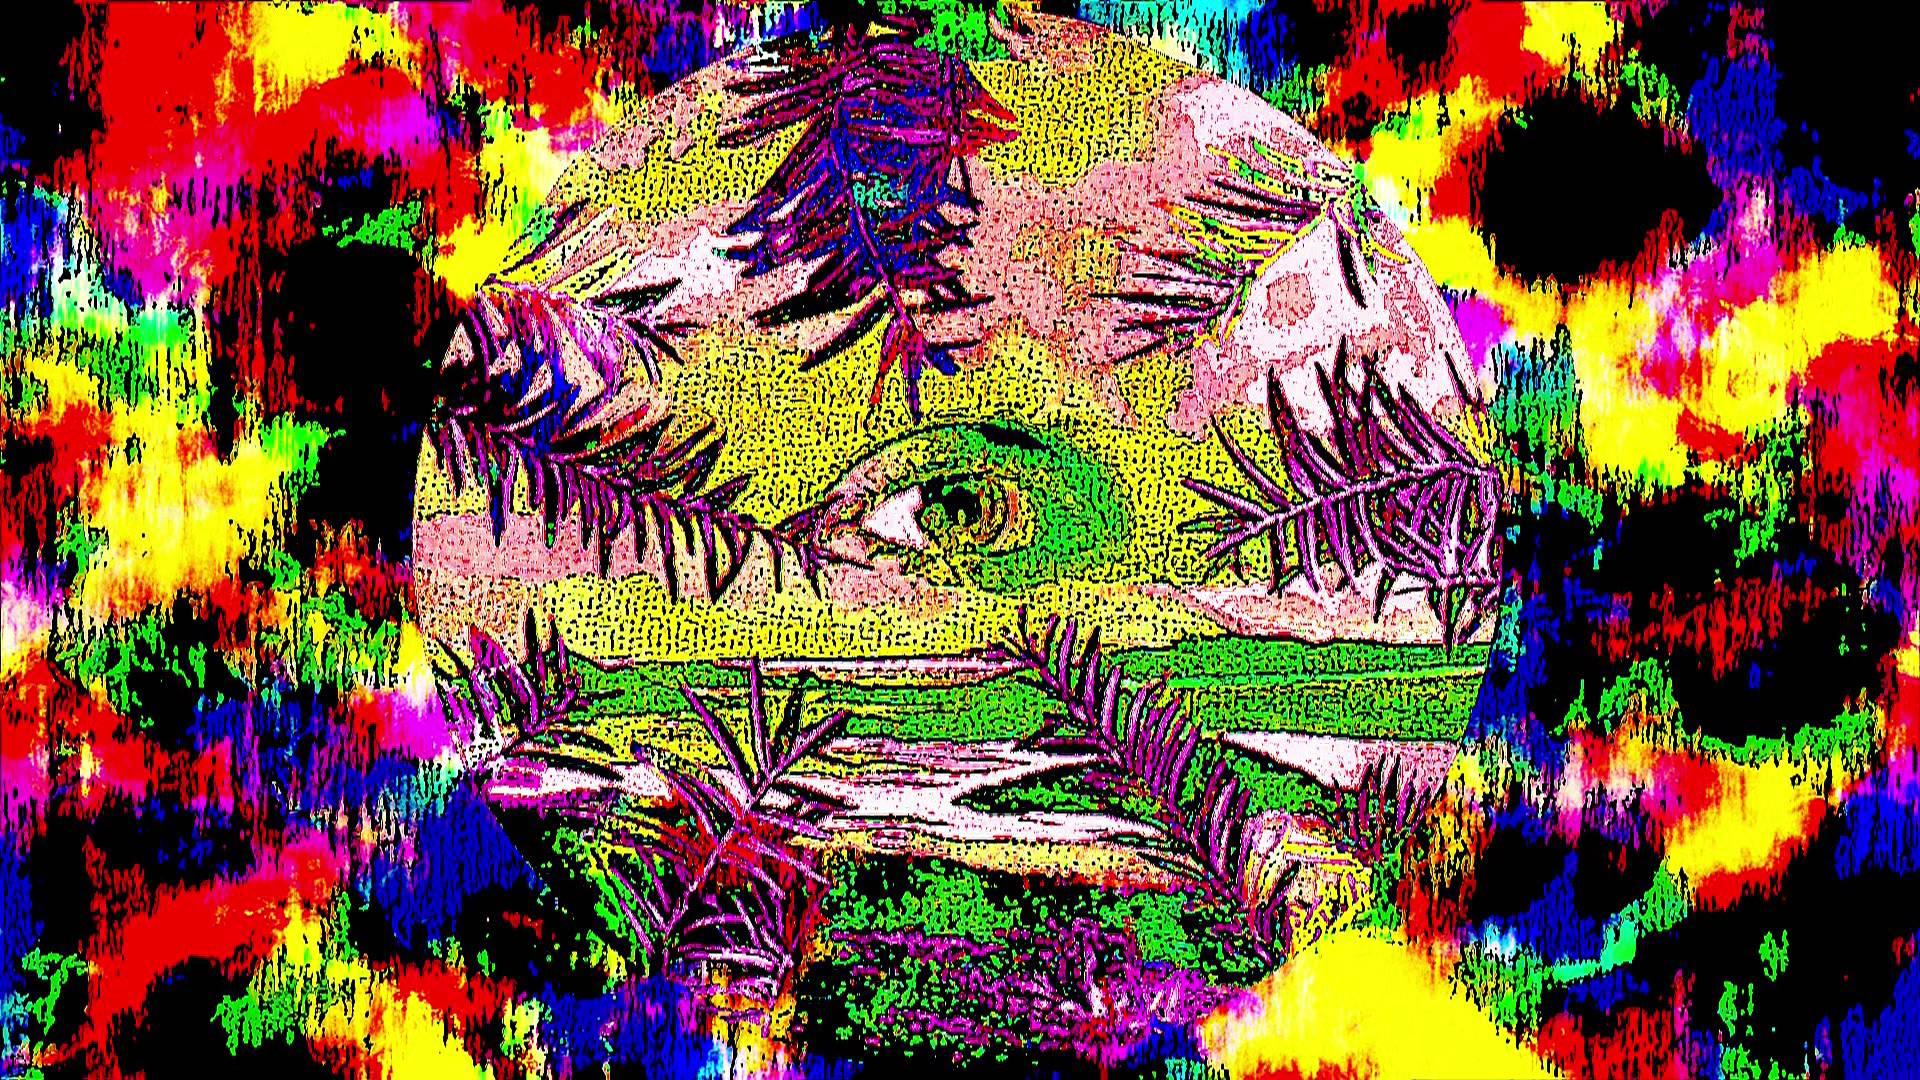 Download Acid Trip Background Wallpapercraft 1920x1080